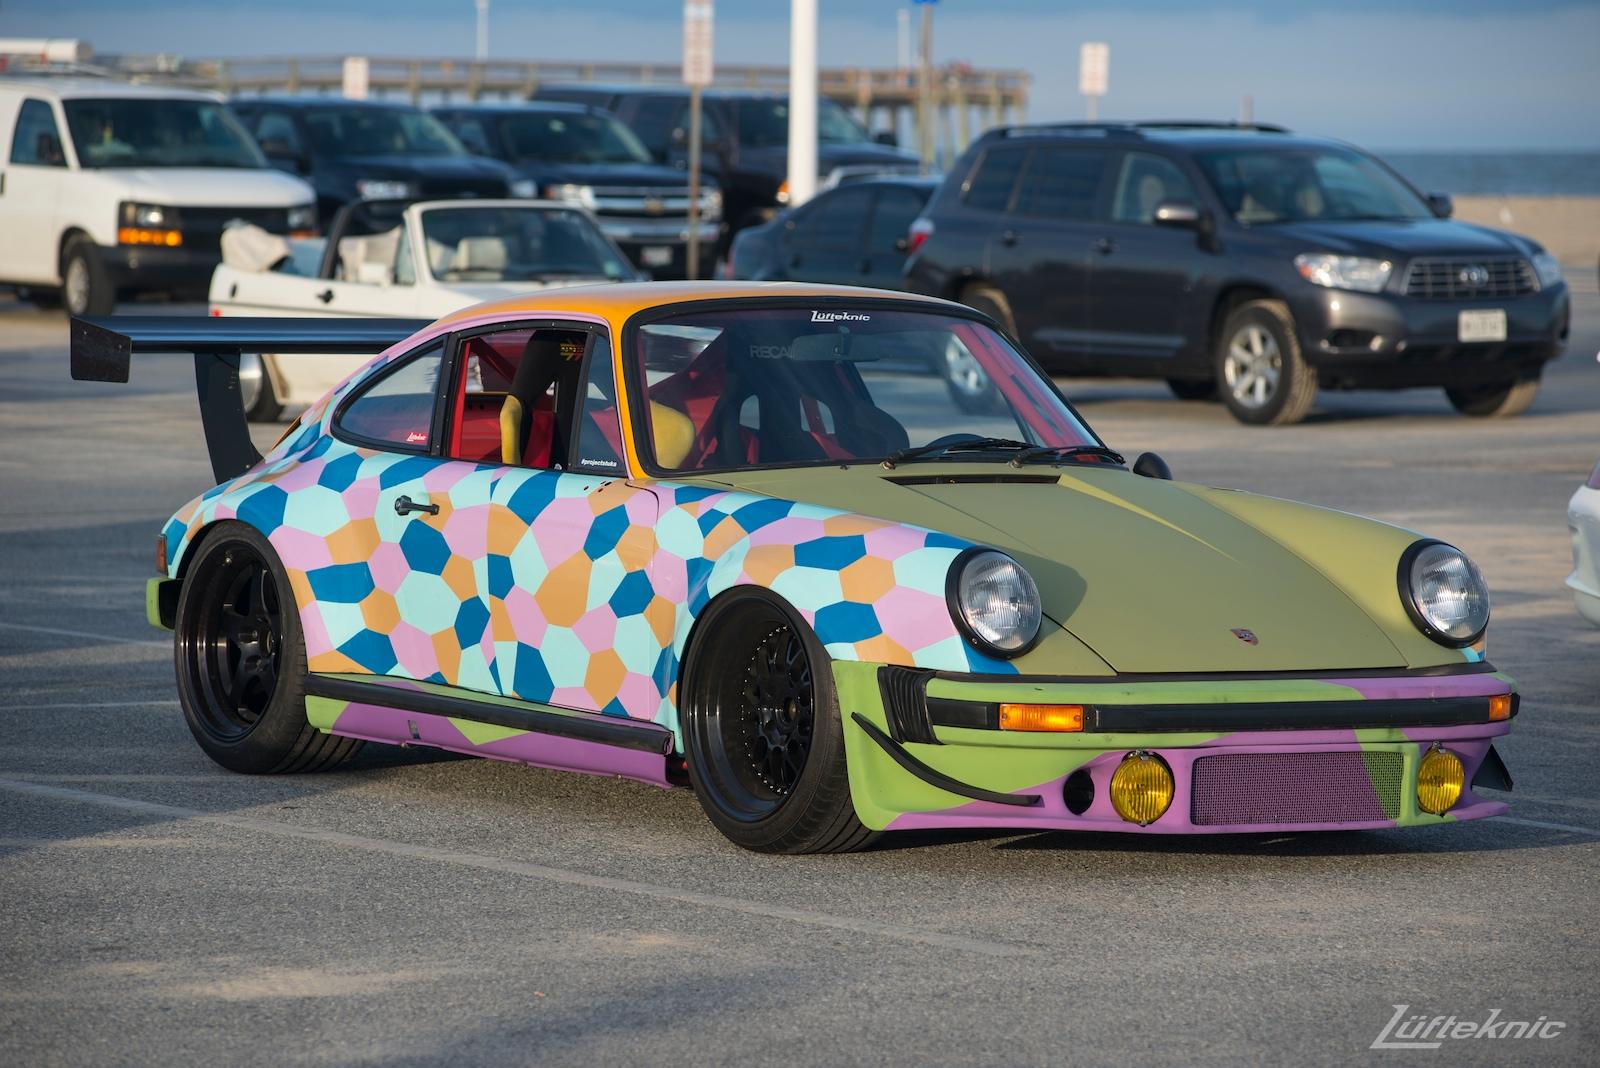 Lüfteknic #projectstuka Porsche 930 Turbo